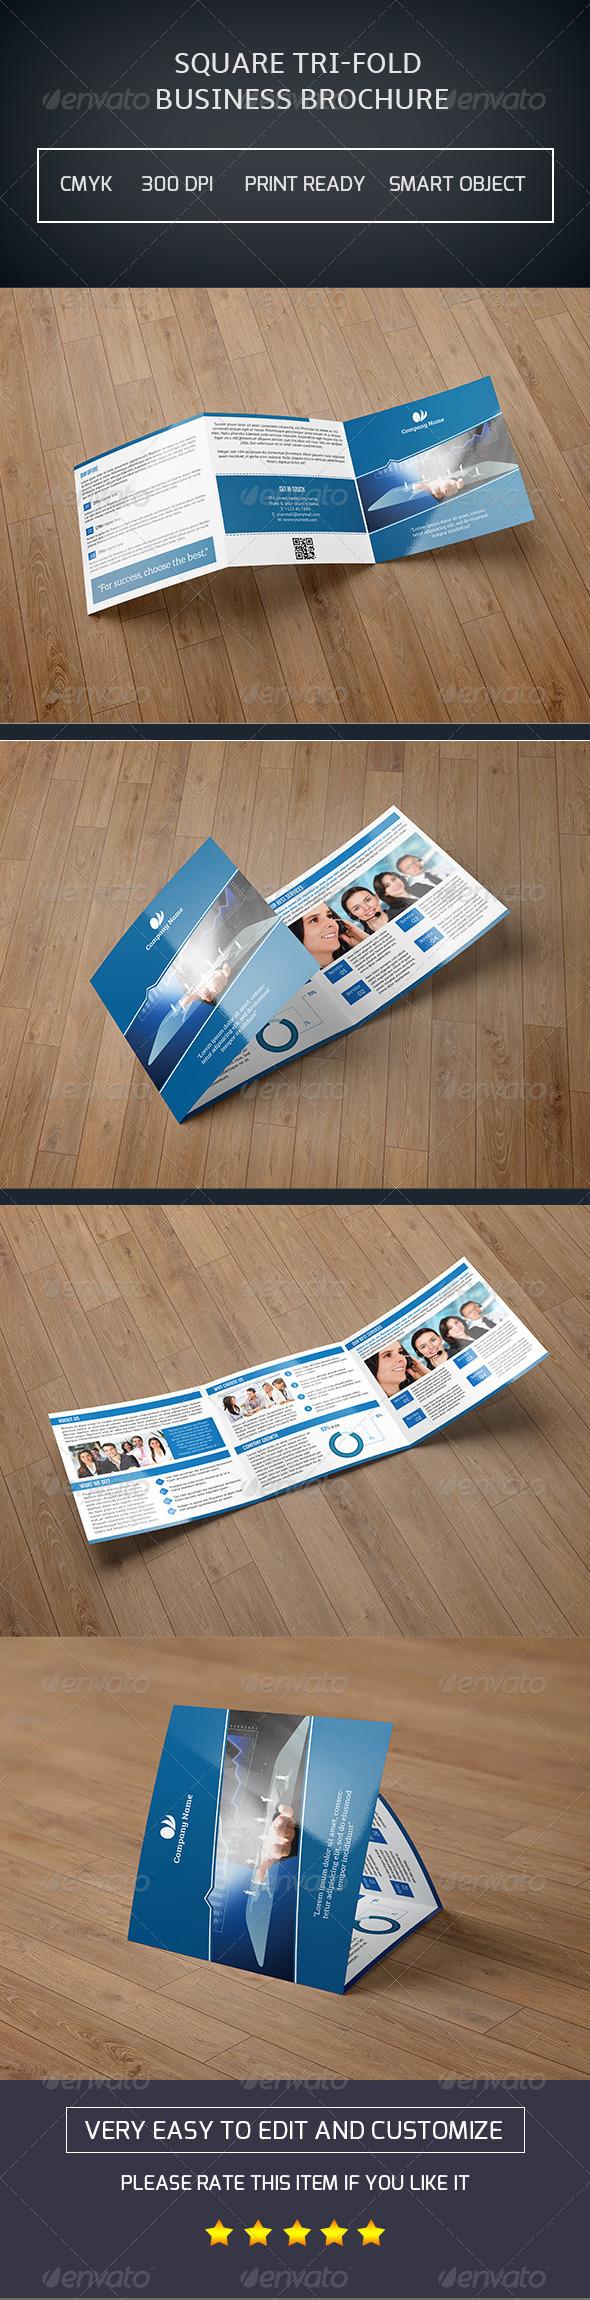 Square Trifold Brochure-V12